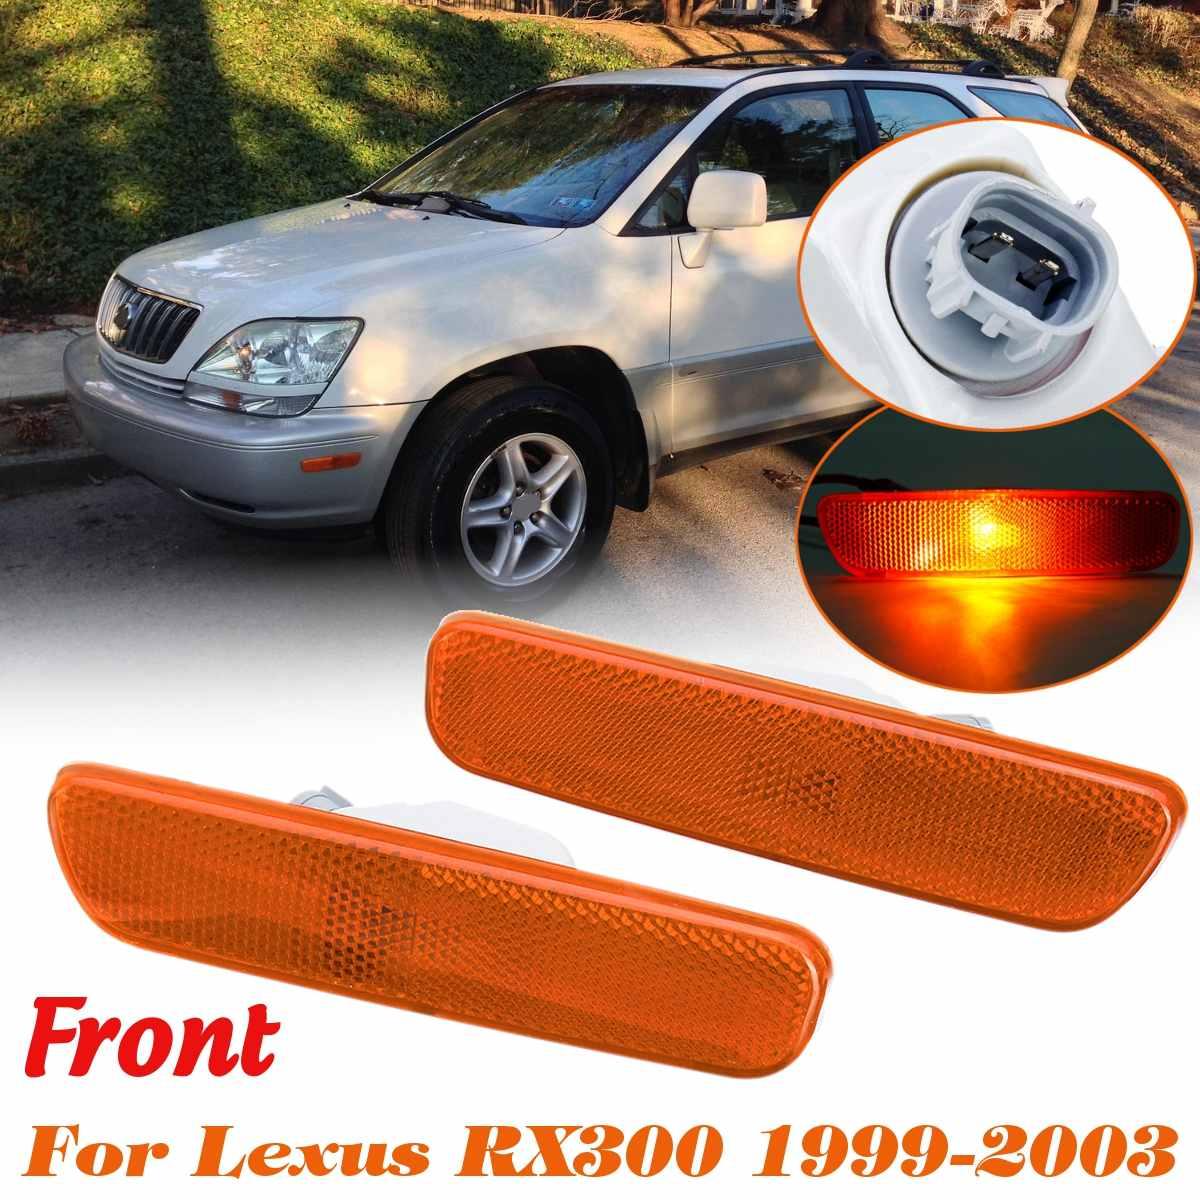 #81740-48010 For Lexus RX300 1999 2000 2001 2002 2003  Left/Right Front Bumper Side Marker Light Lamp